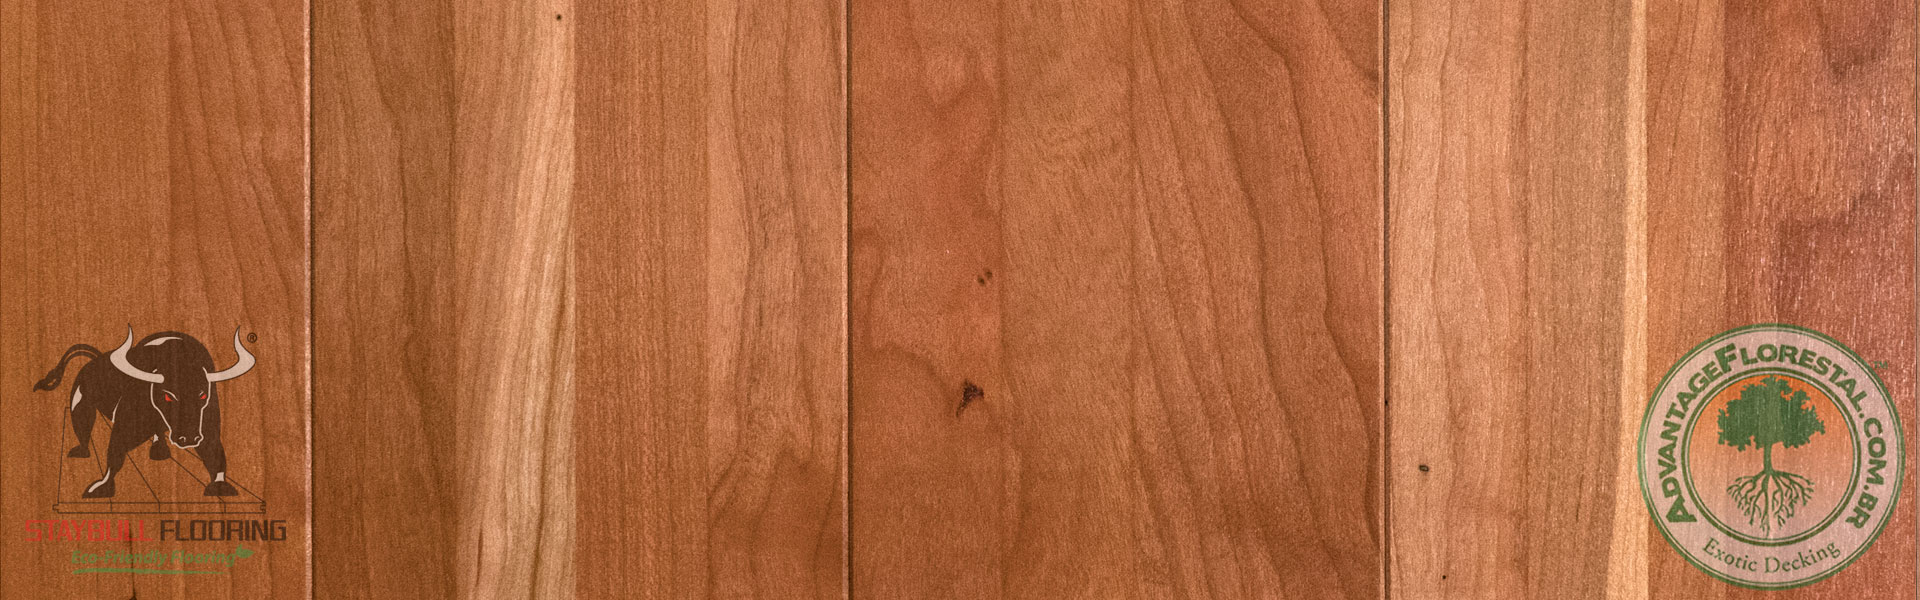 Staybull American Cherryeco-friendly exotic hardwood flooring